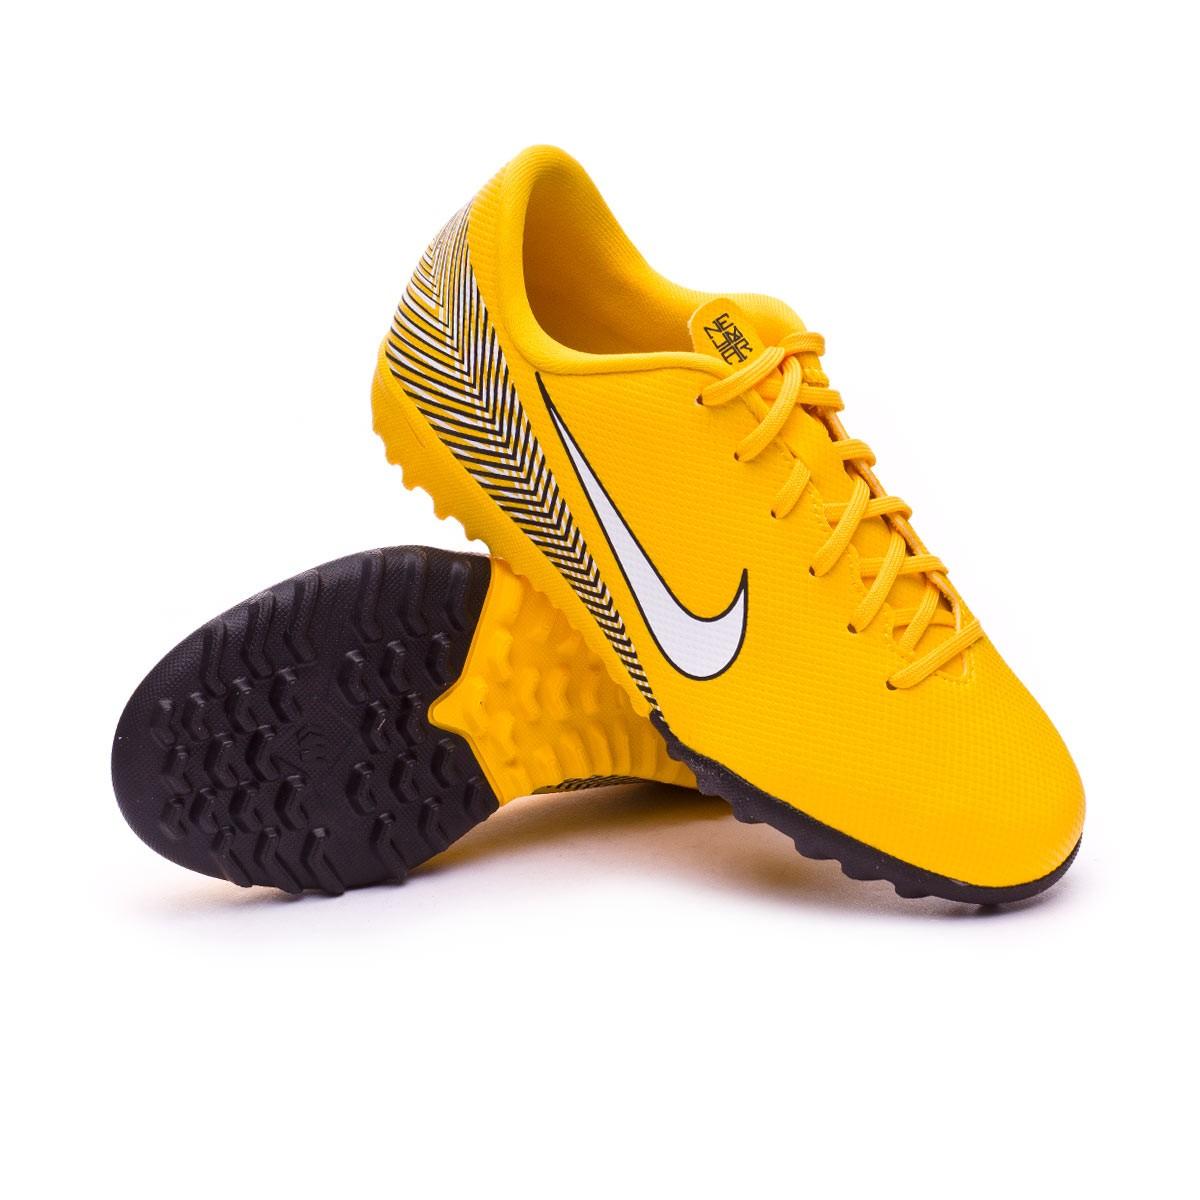 sports shoes 9848e 1c70f Nike Kids Mercurial VaporX XII Academy Turf Neymar Football Boot